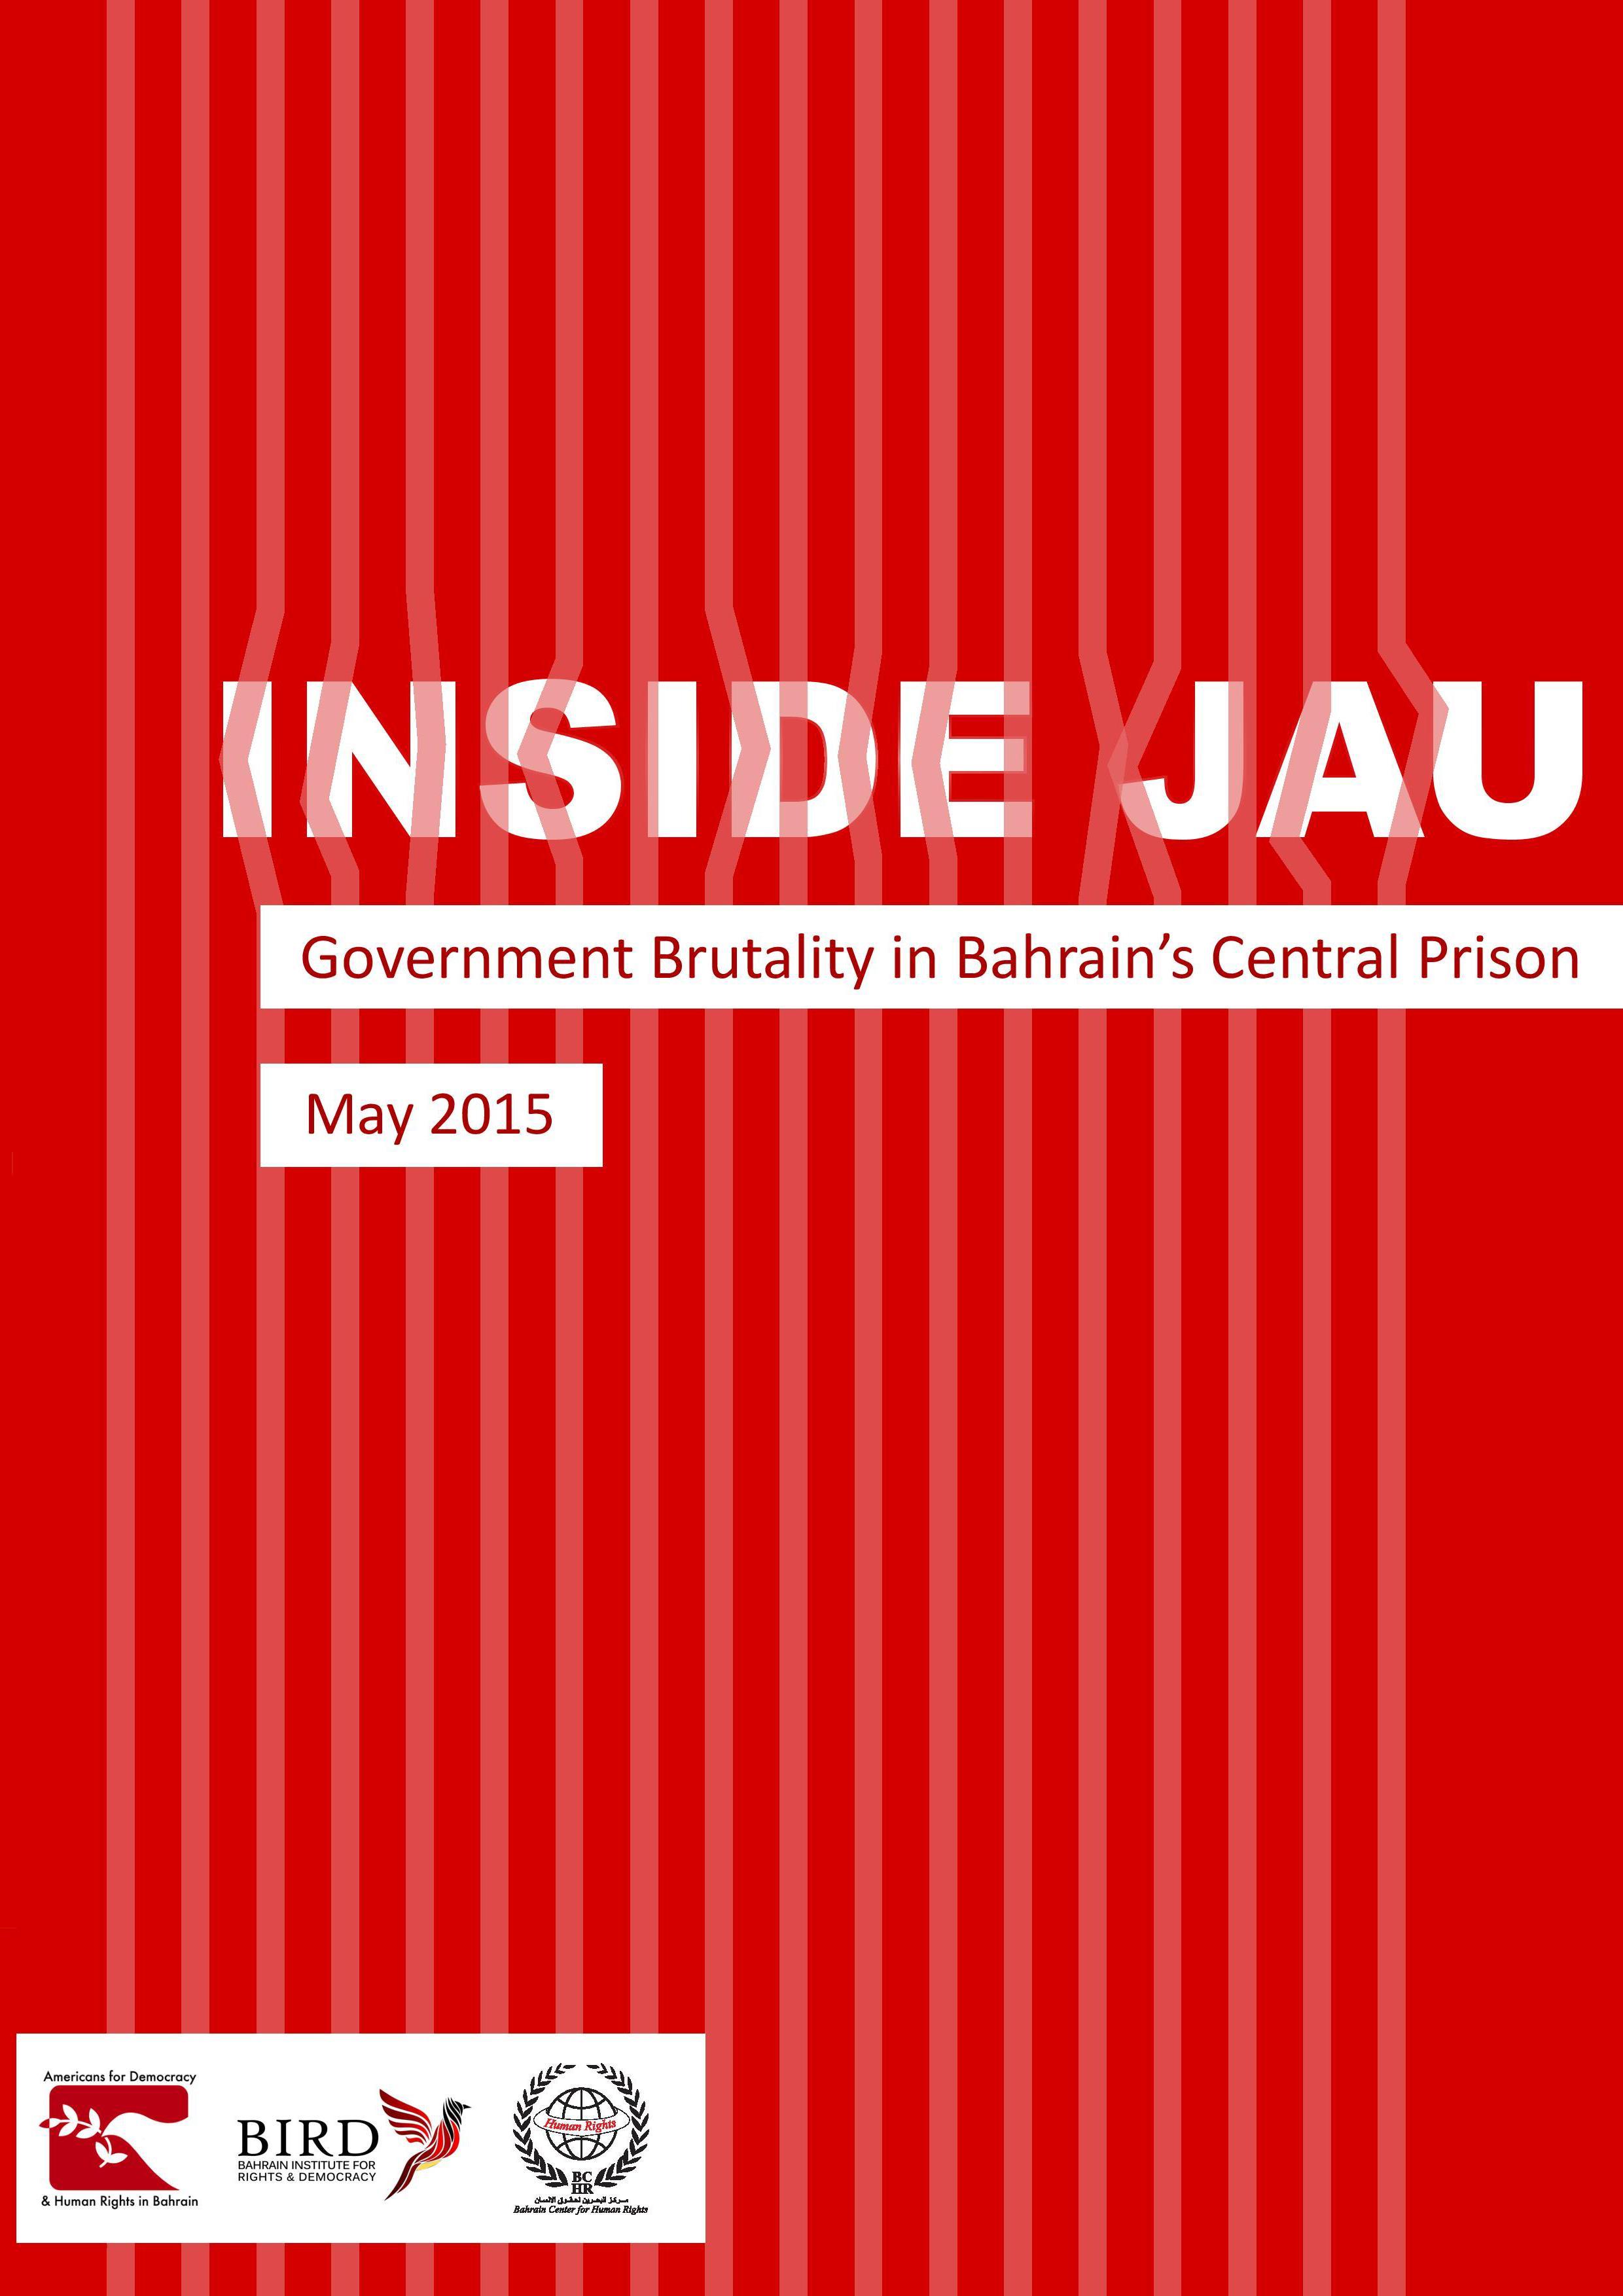 Inside Jau: Rampant Torture and Abuse Inside Bahrain's Political Prison